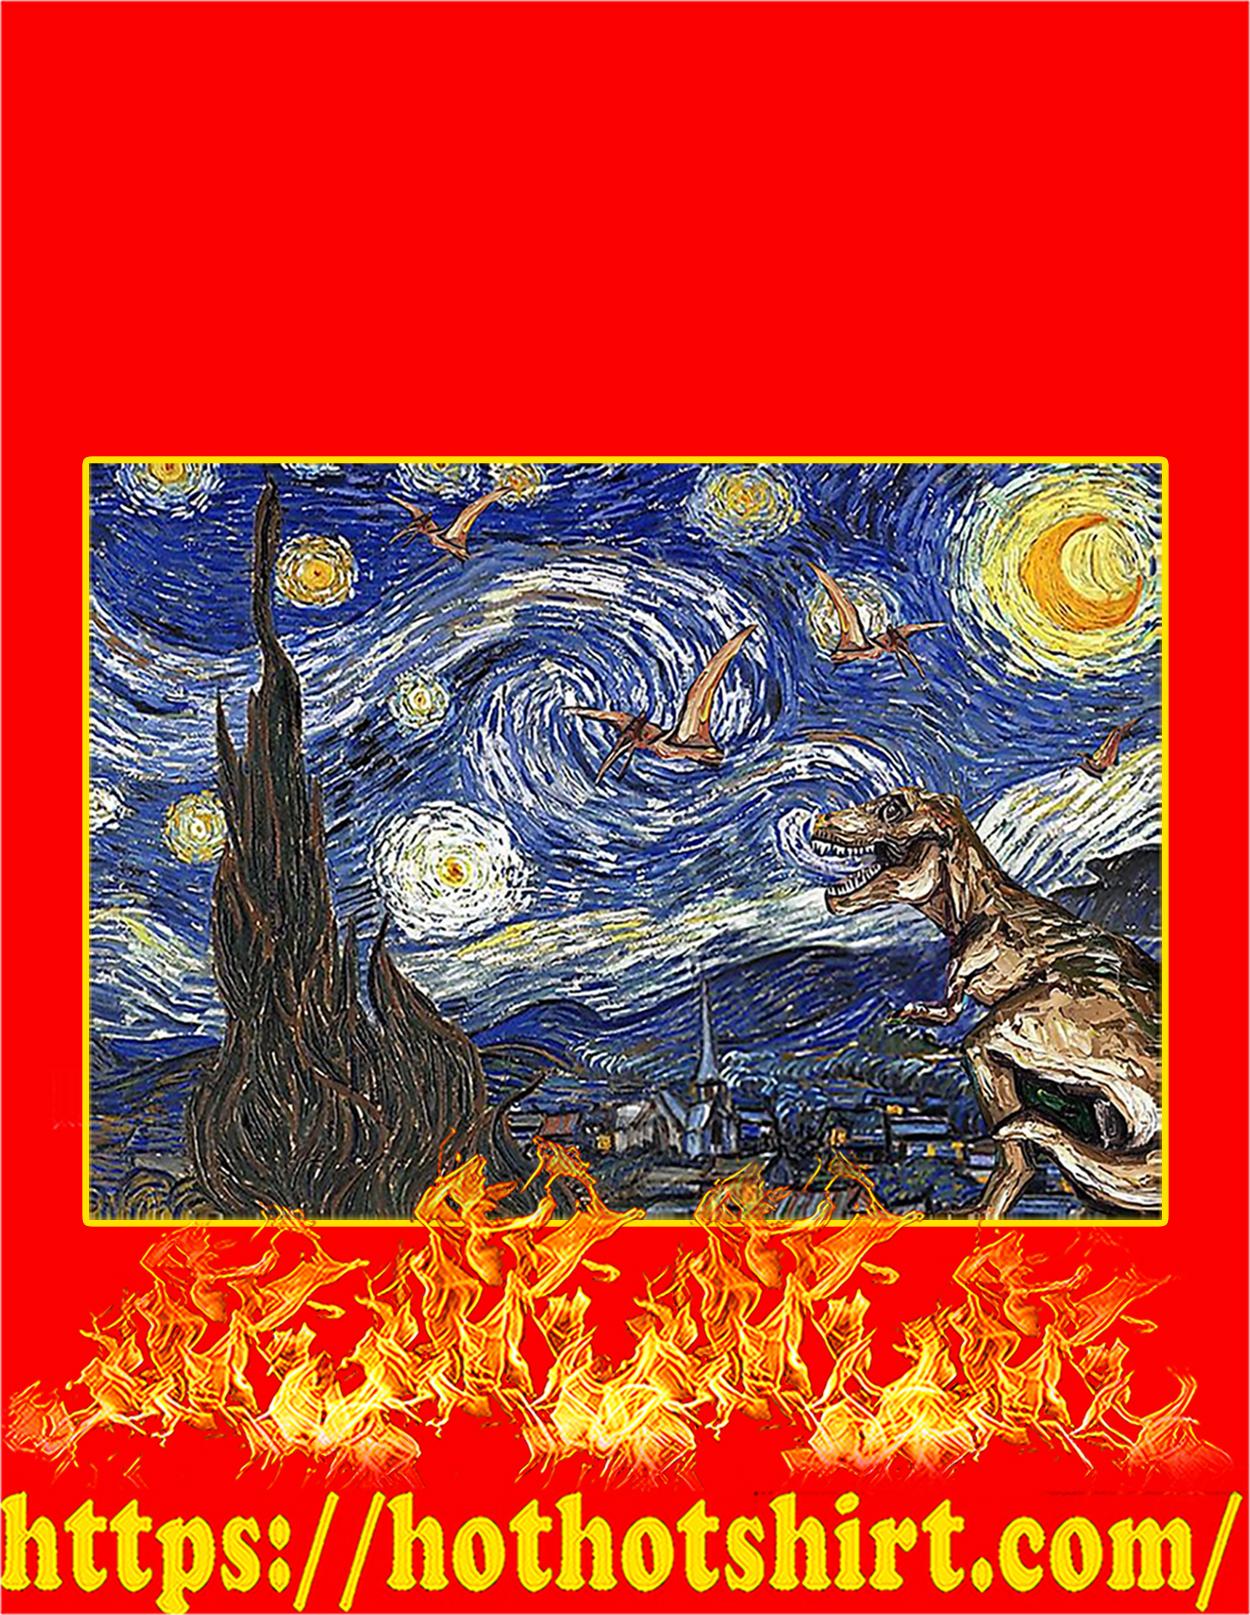 Starry night dinosaur poster - A3